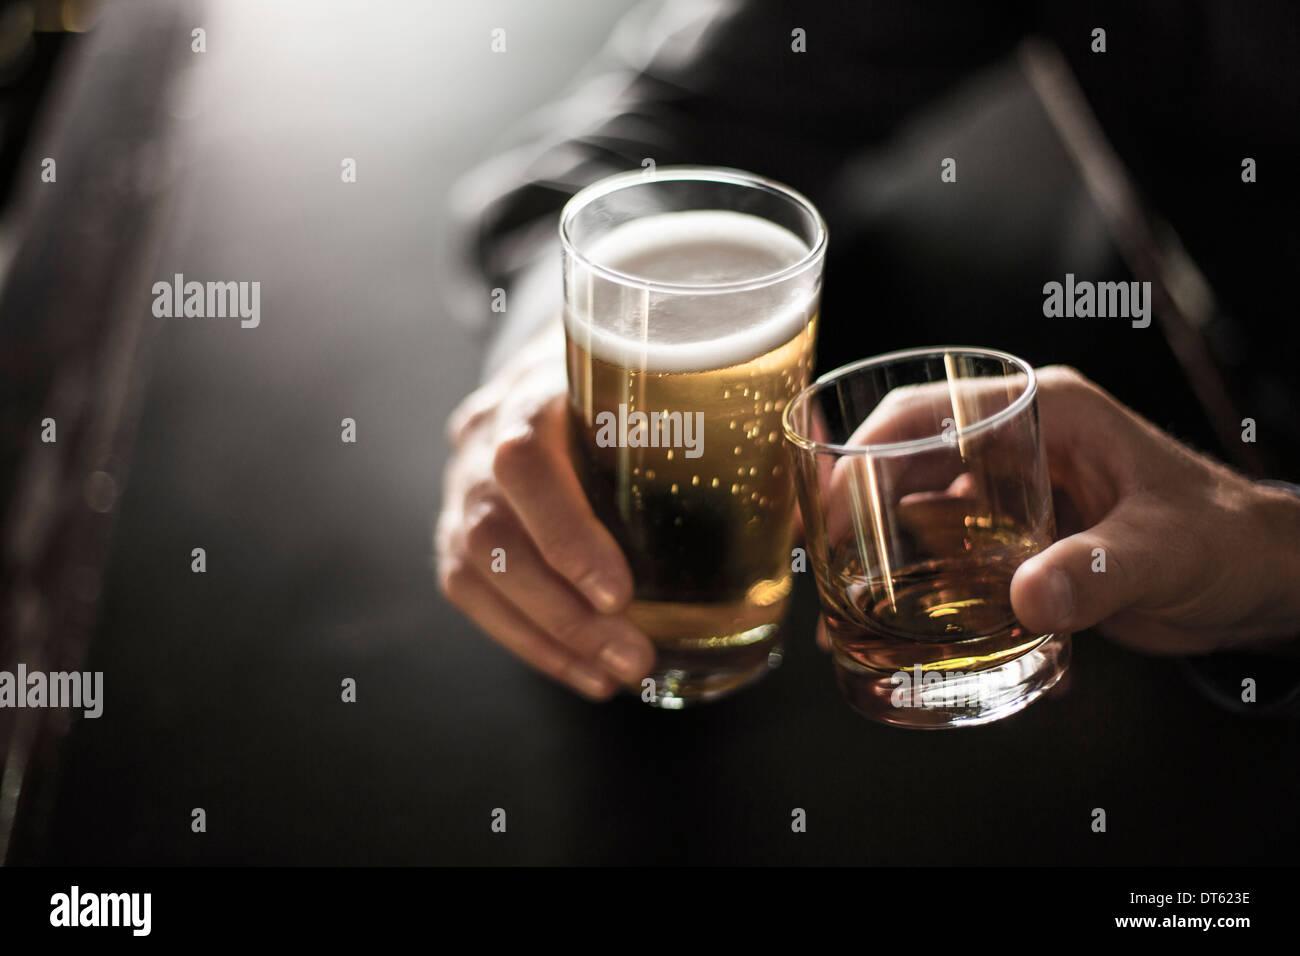 Cerca de dos hombres en el bar de bebidas de tostado Imagen De Stock